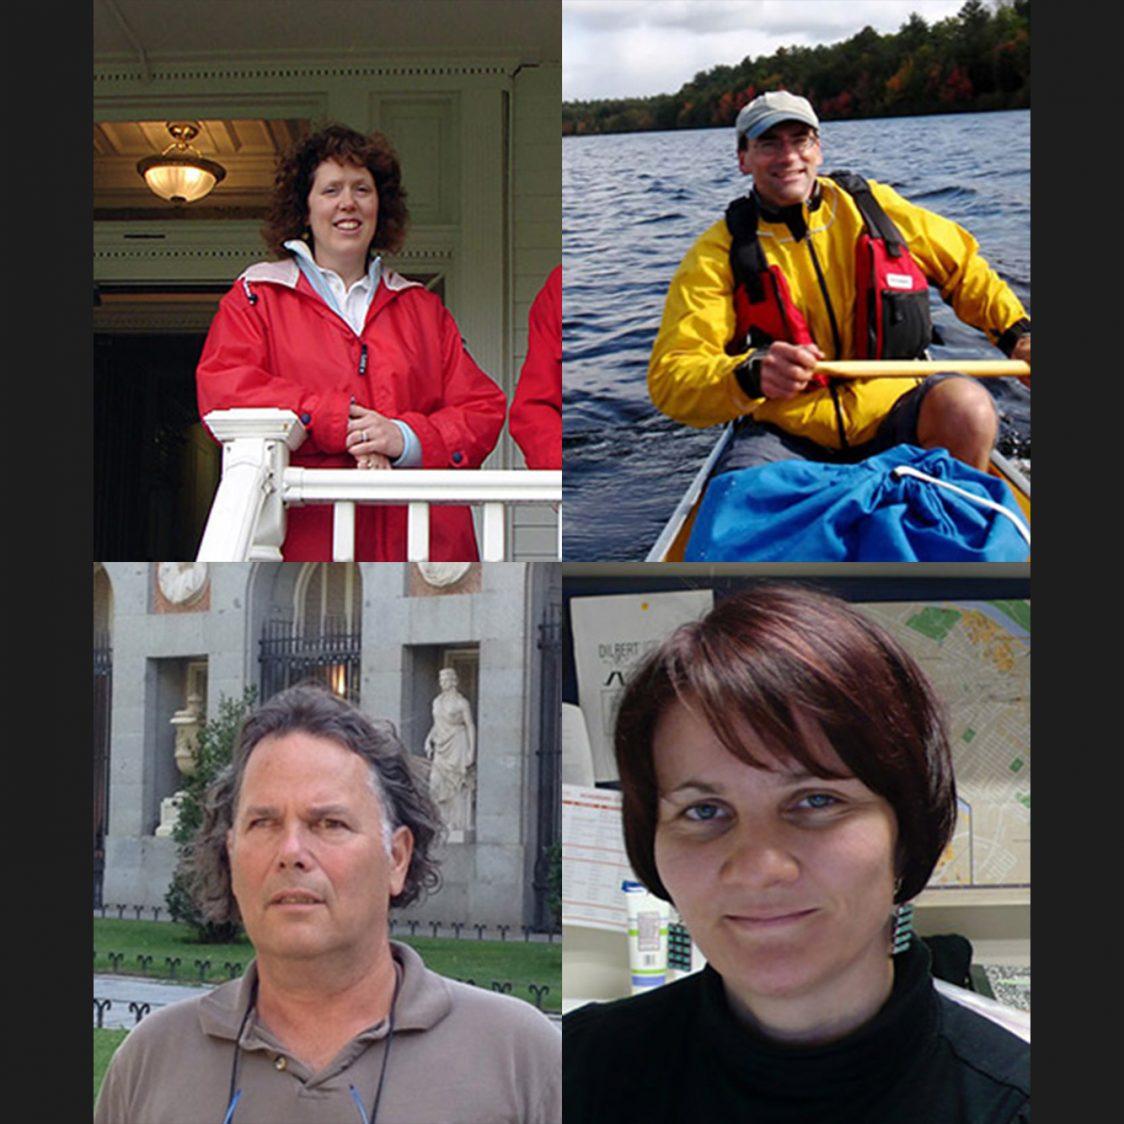 SEBS Names Four EOAS Faculty Members 2020 Excellence Award Recipients